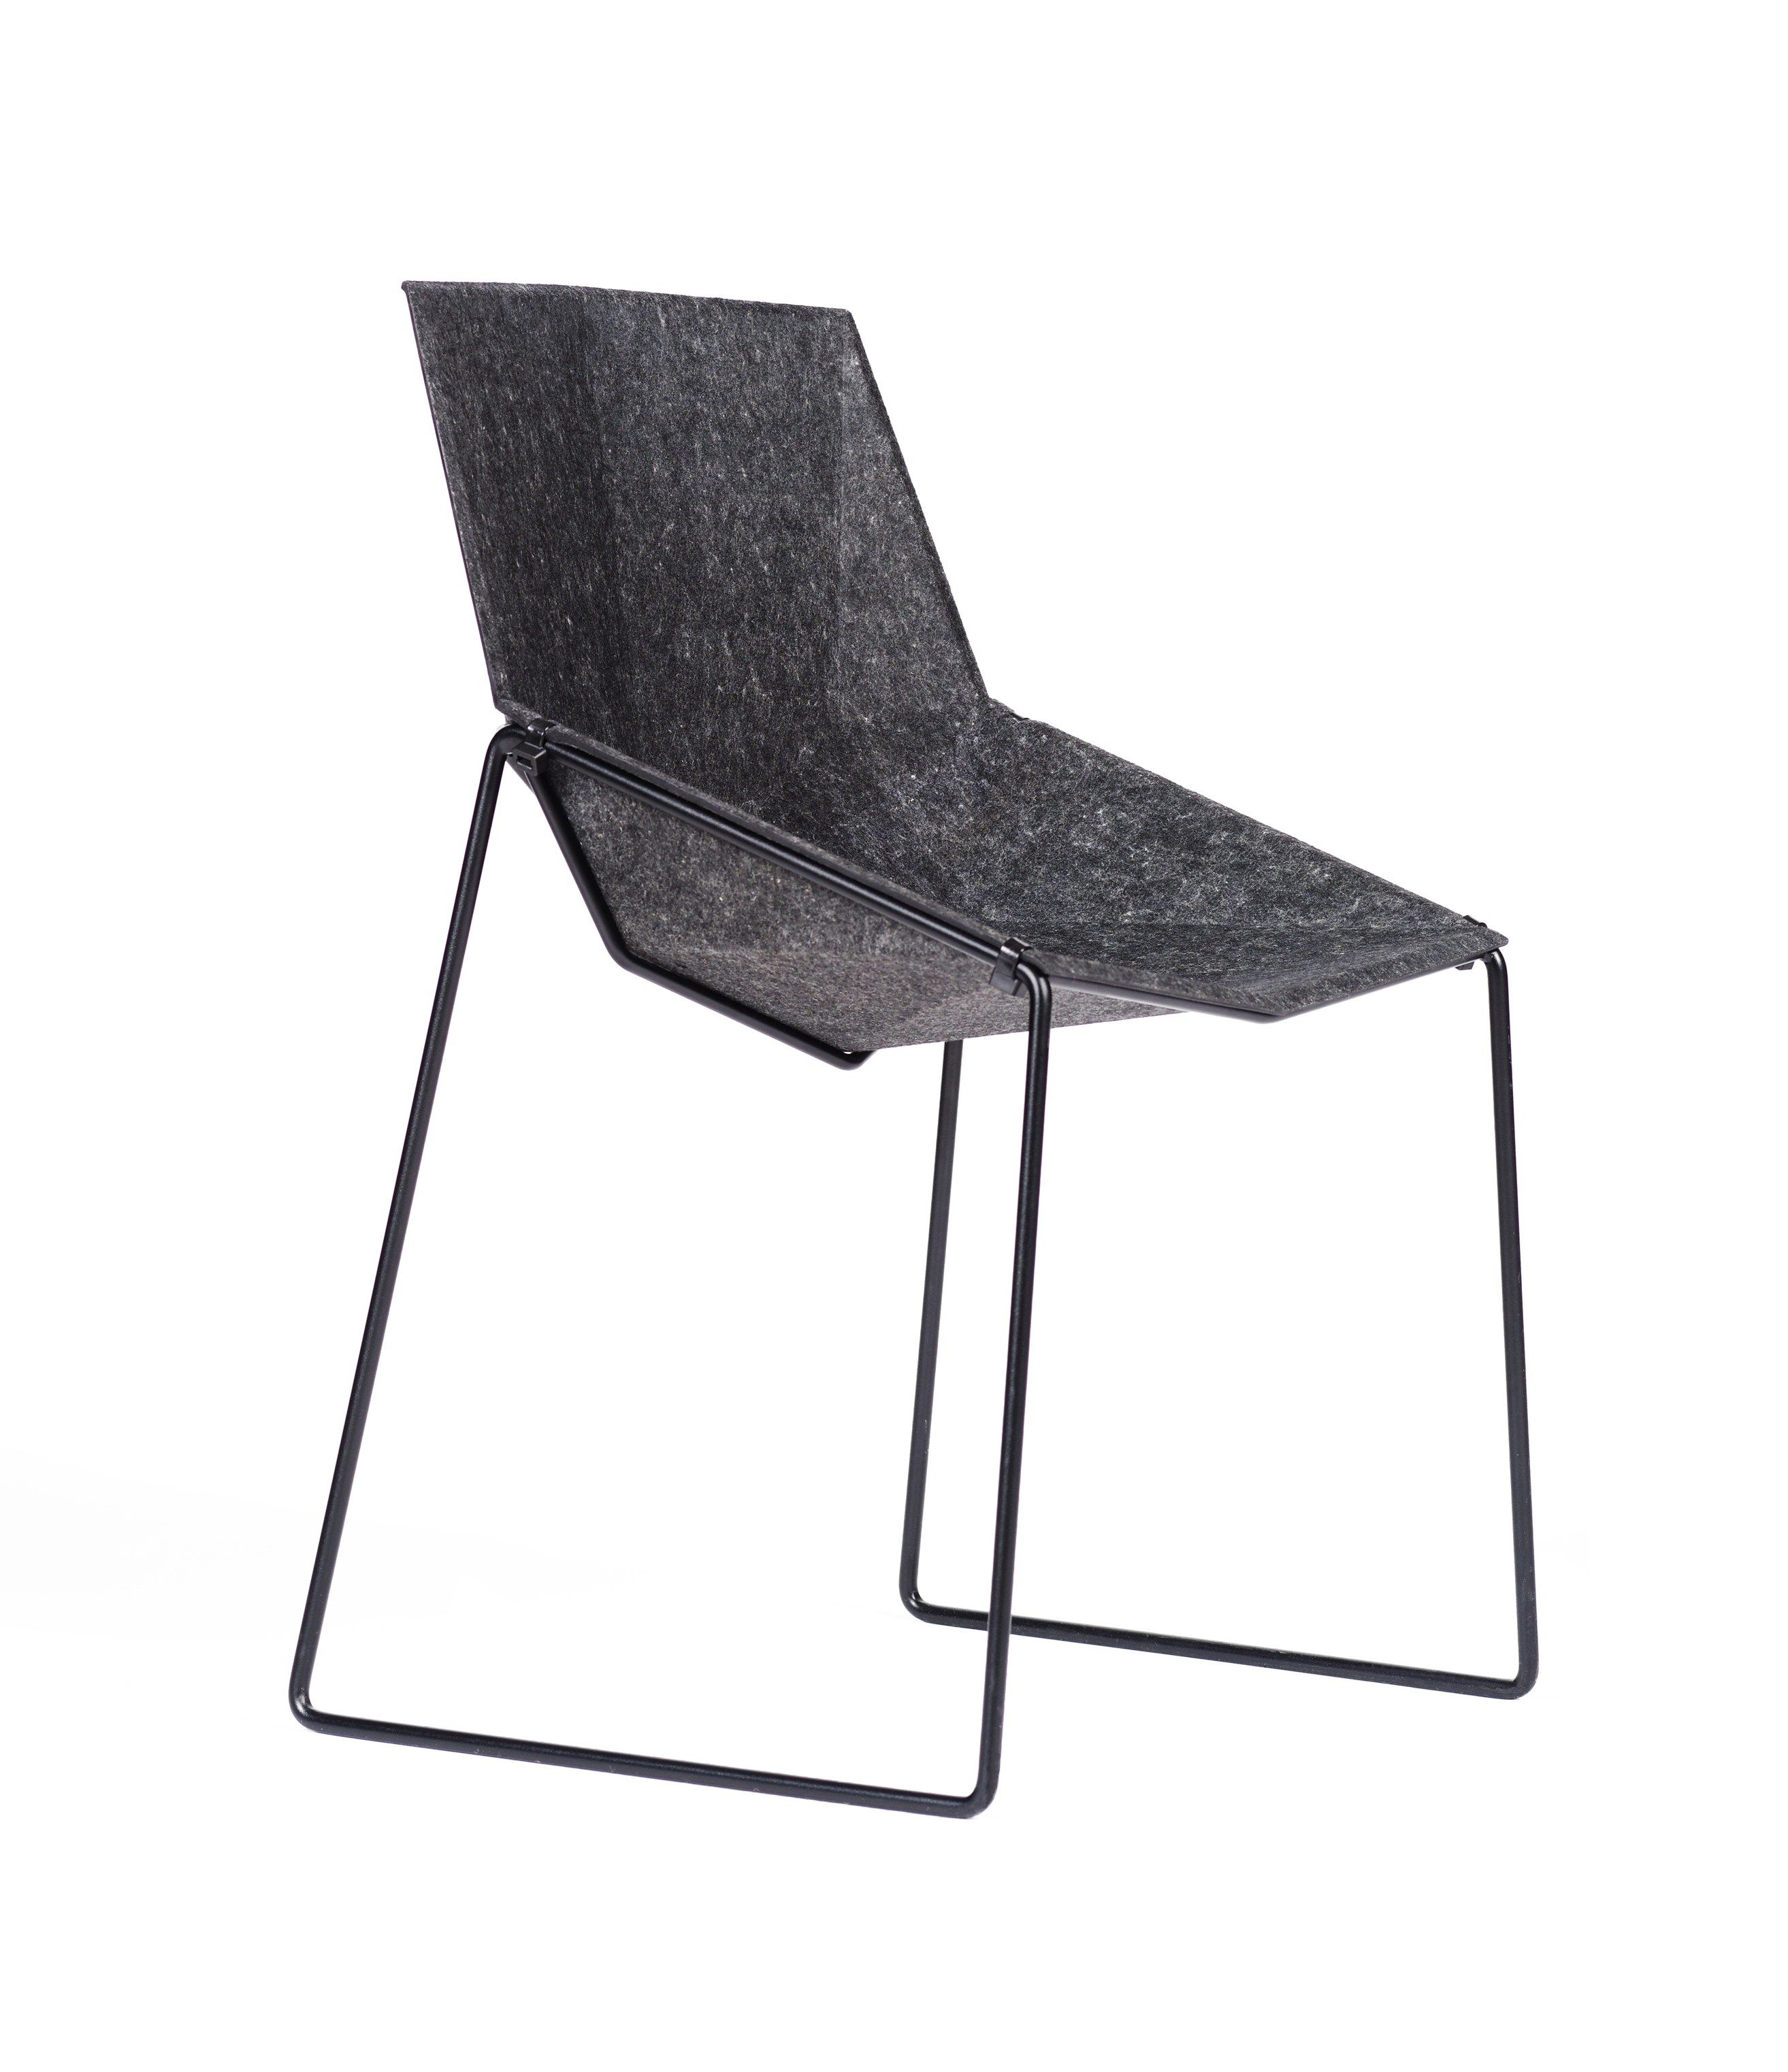 Recycled felt chair NICO LESS by DONAR design Primož Jeza